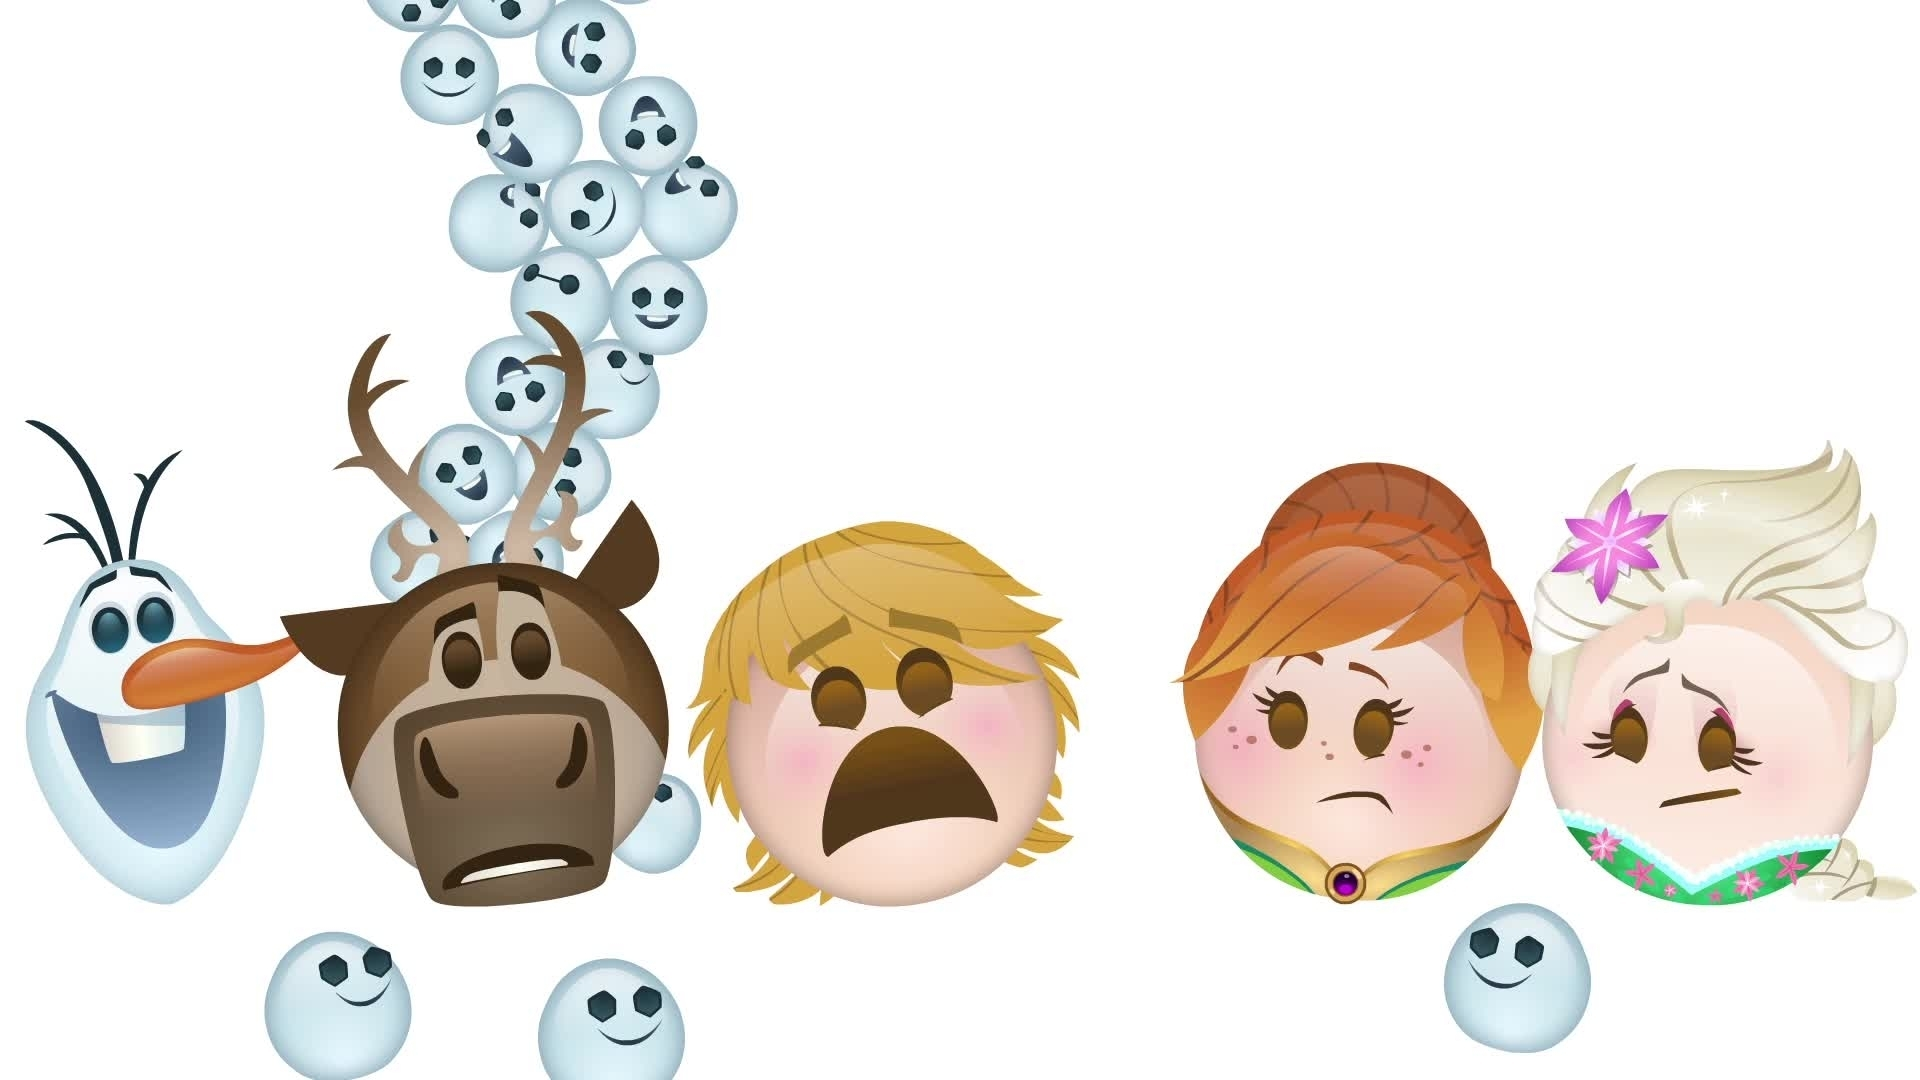 Festa Frozen Contada por Emojis